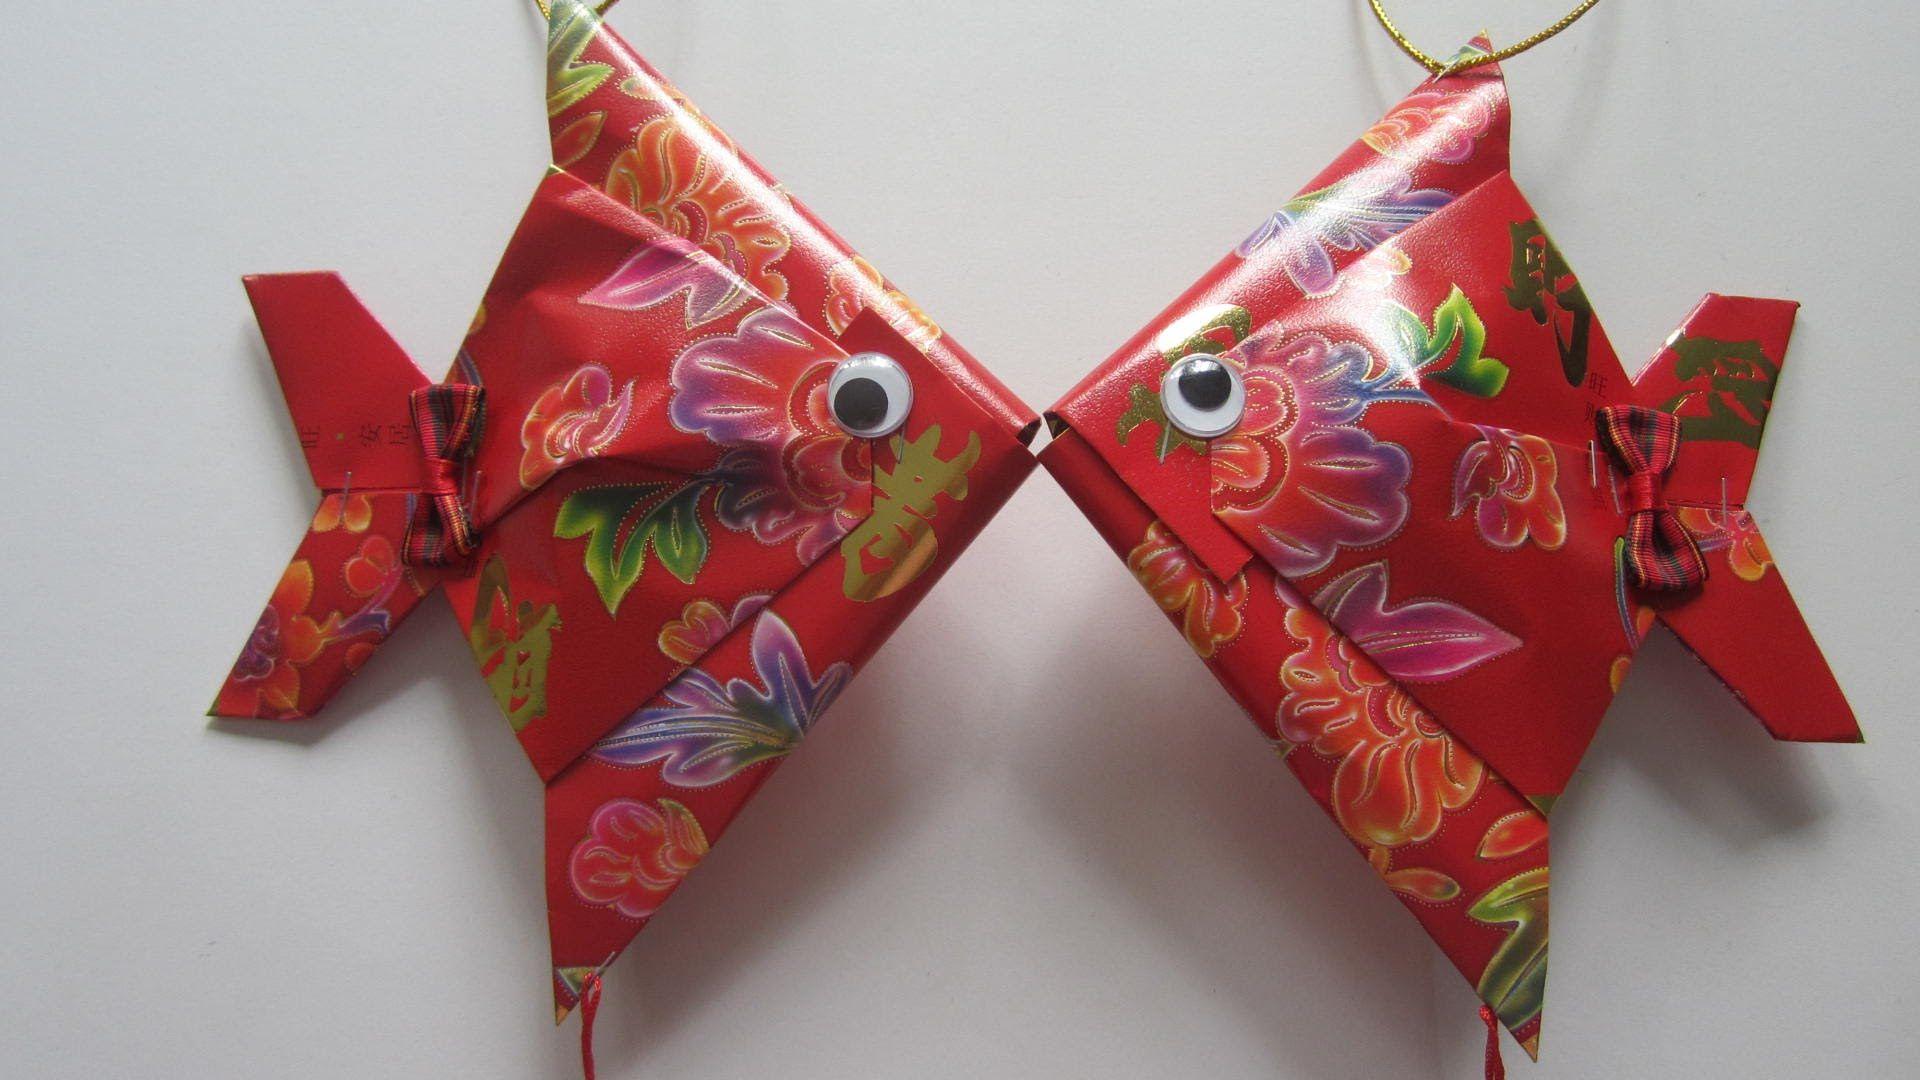 CNY TUTORIAL NO. 28 Small Red Packet (Hongbao) Fish